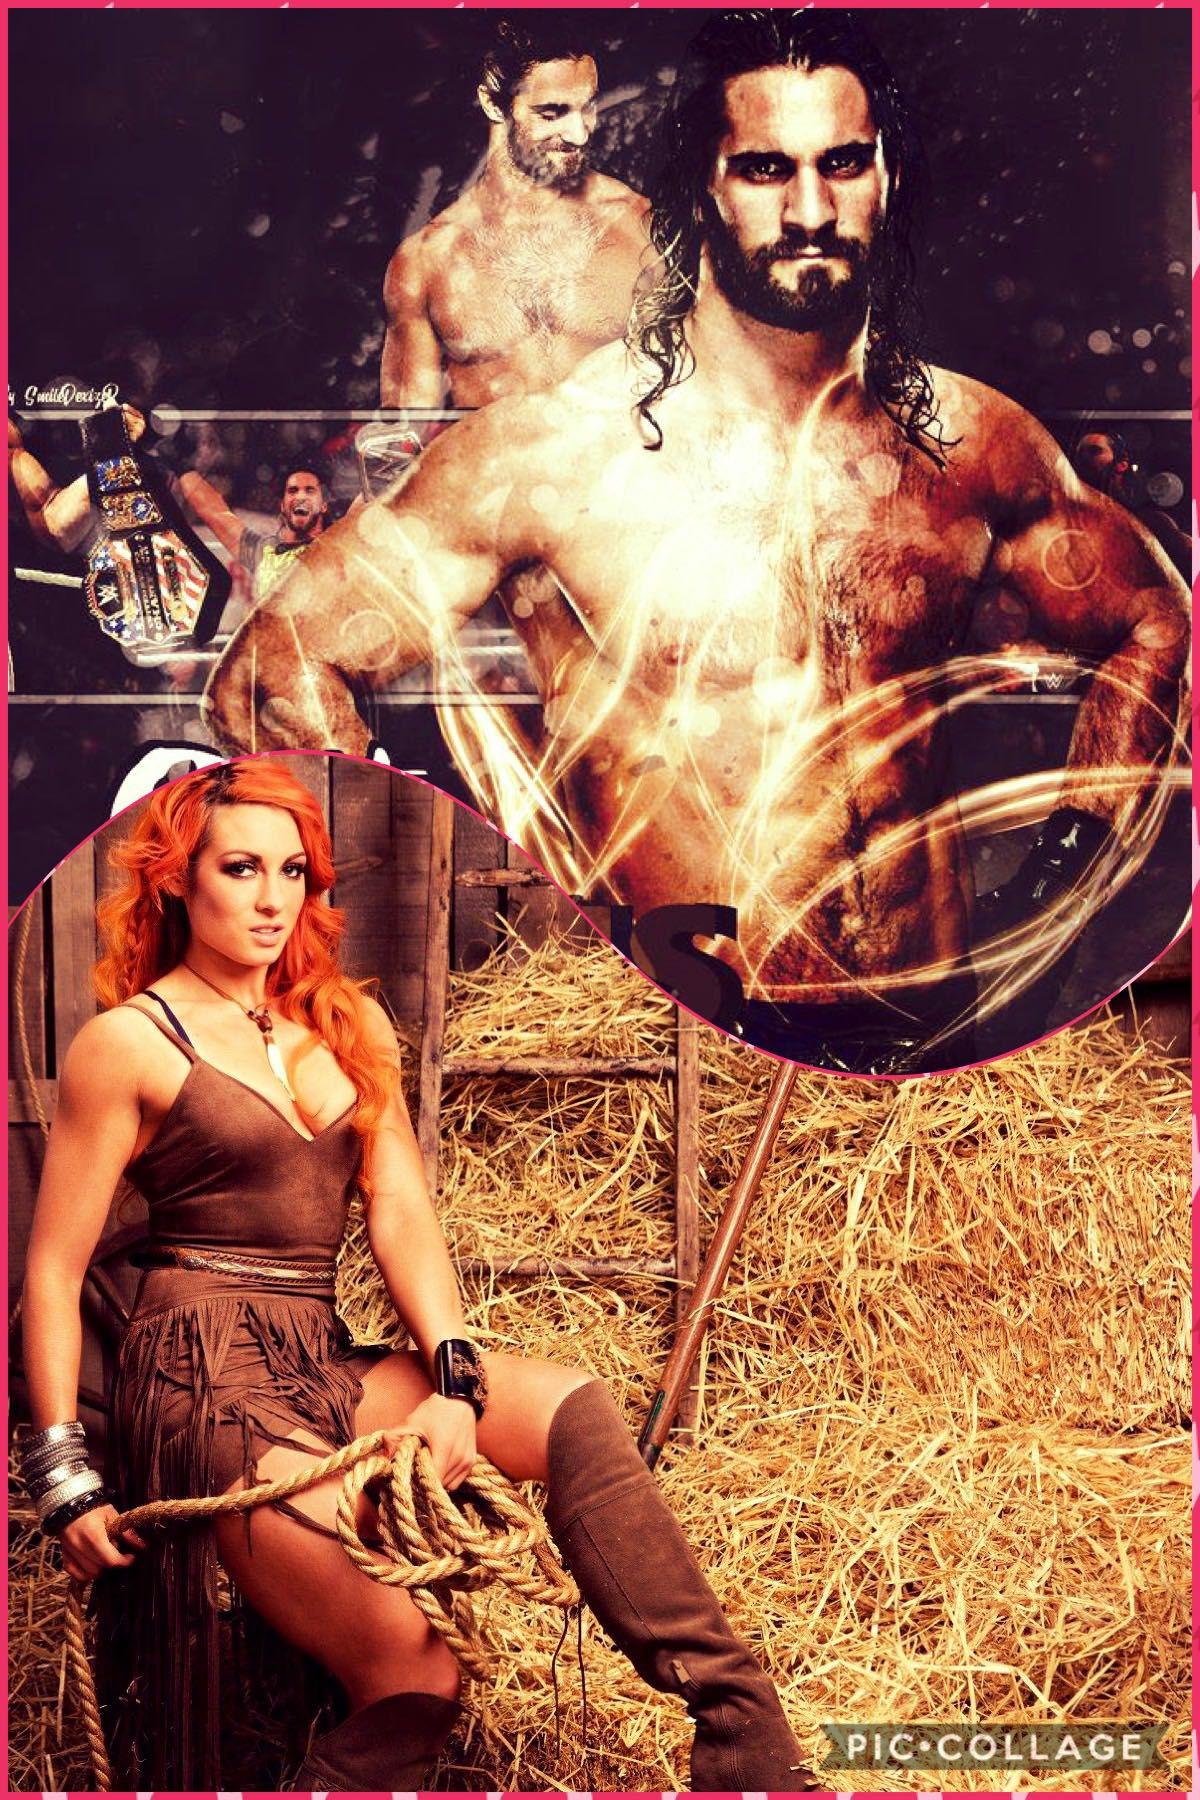 Seth Rollins Becky Lynch : rollins, becky, lynch, 🔥*The, Man's, Architect*🌹, (WWE:Becky, Lynch, Rollins), *Coming, 2019*, Story, Between, Architect, Wattpad